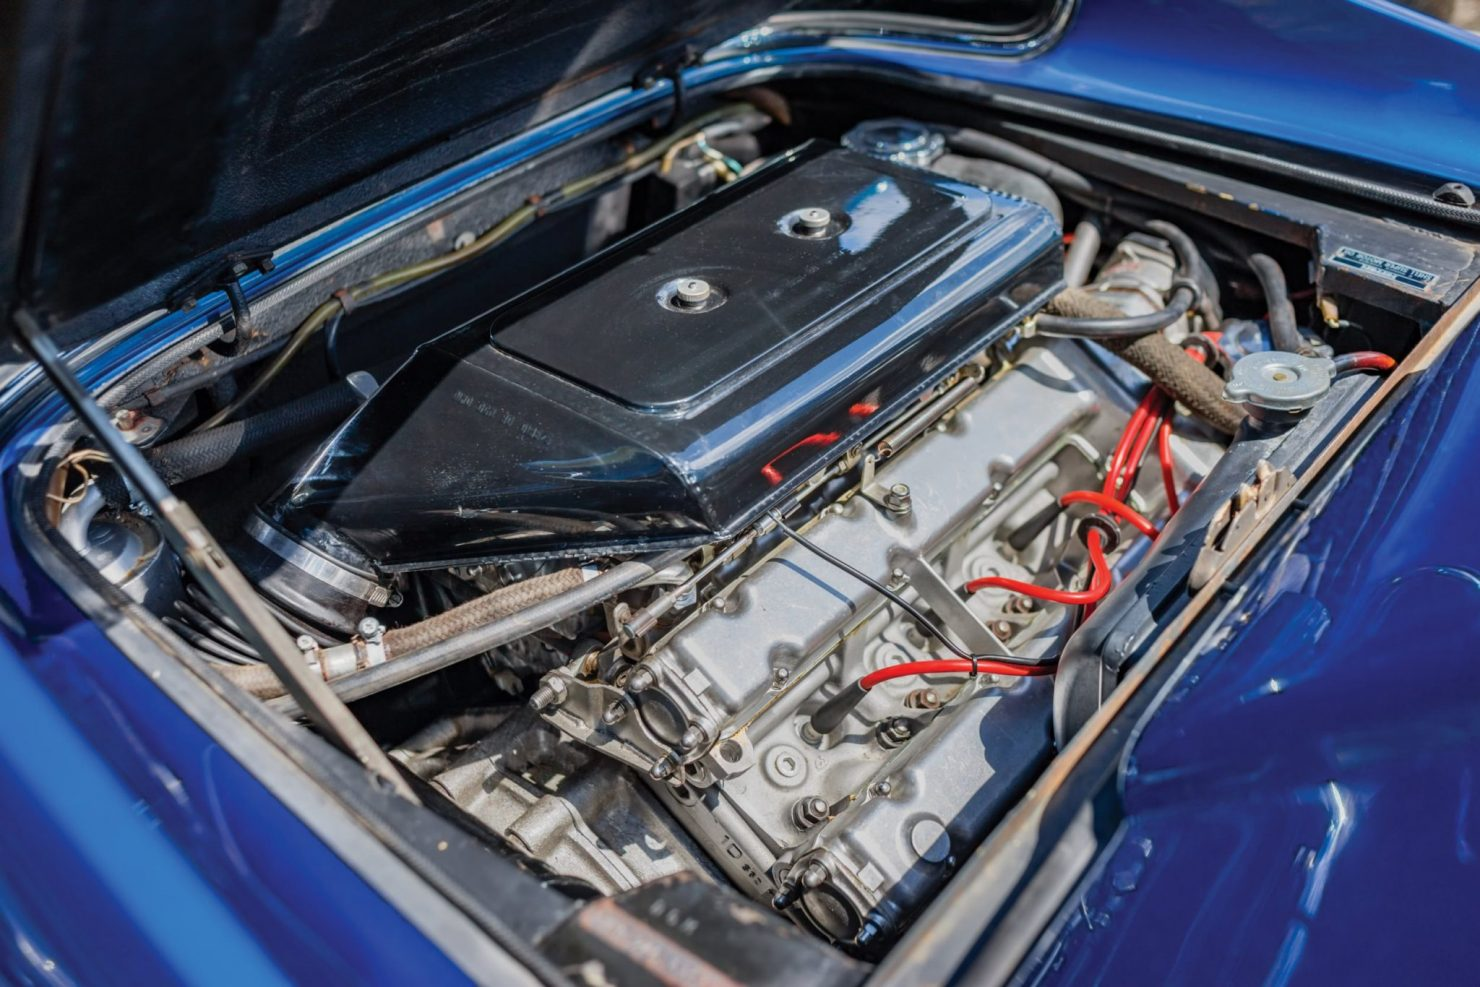 ferrari dino 246 gts car 3 1480x987 - 1973 Ferrari Dino 246 GTS